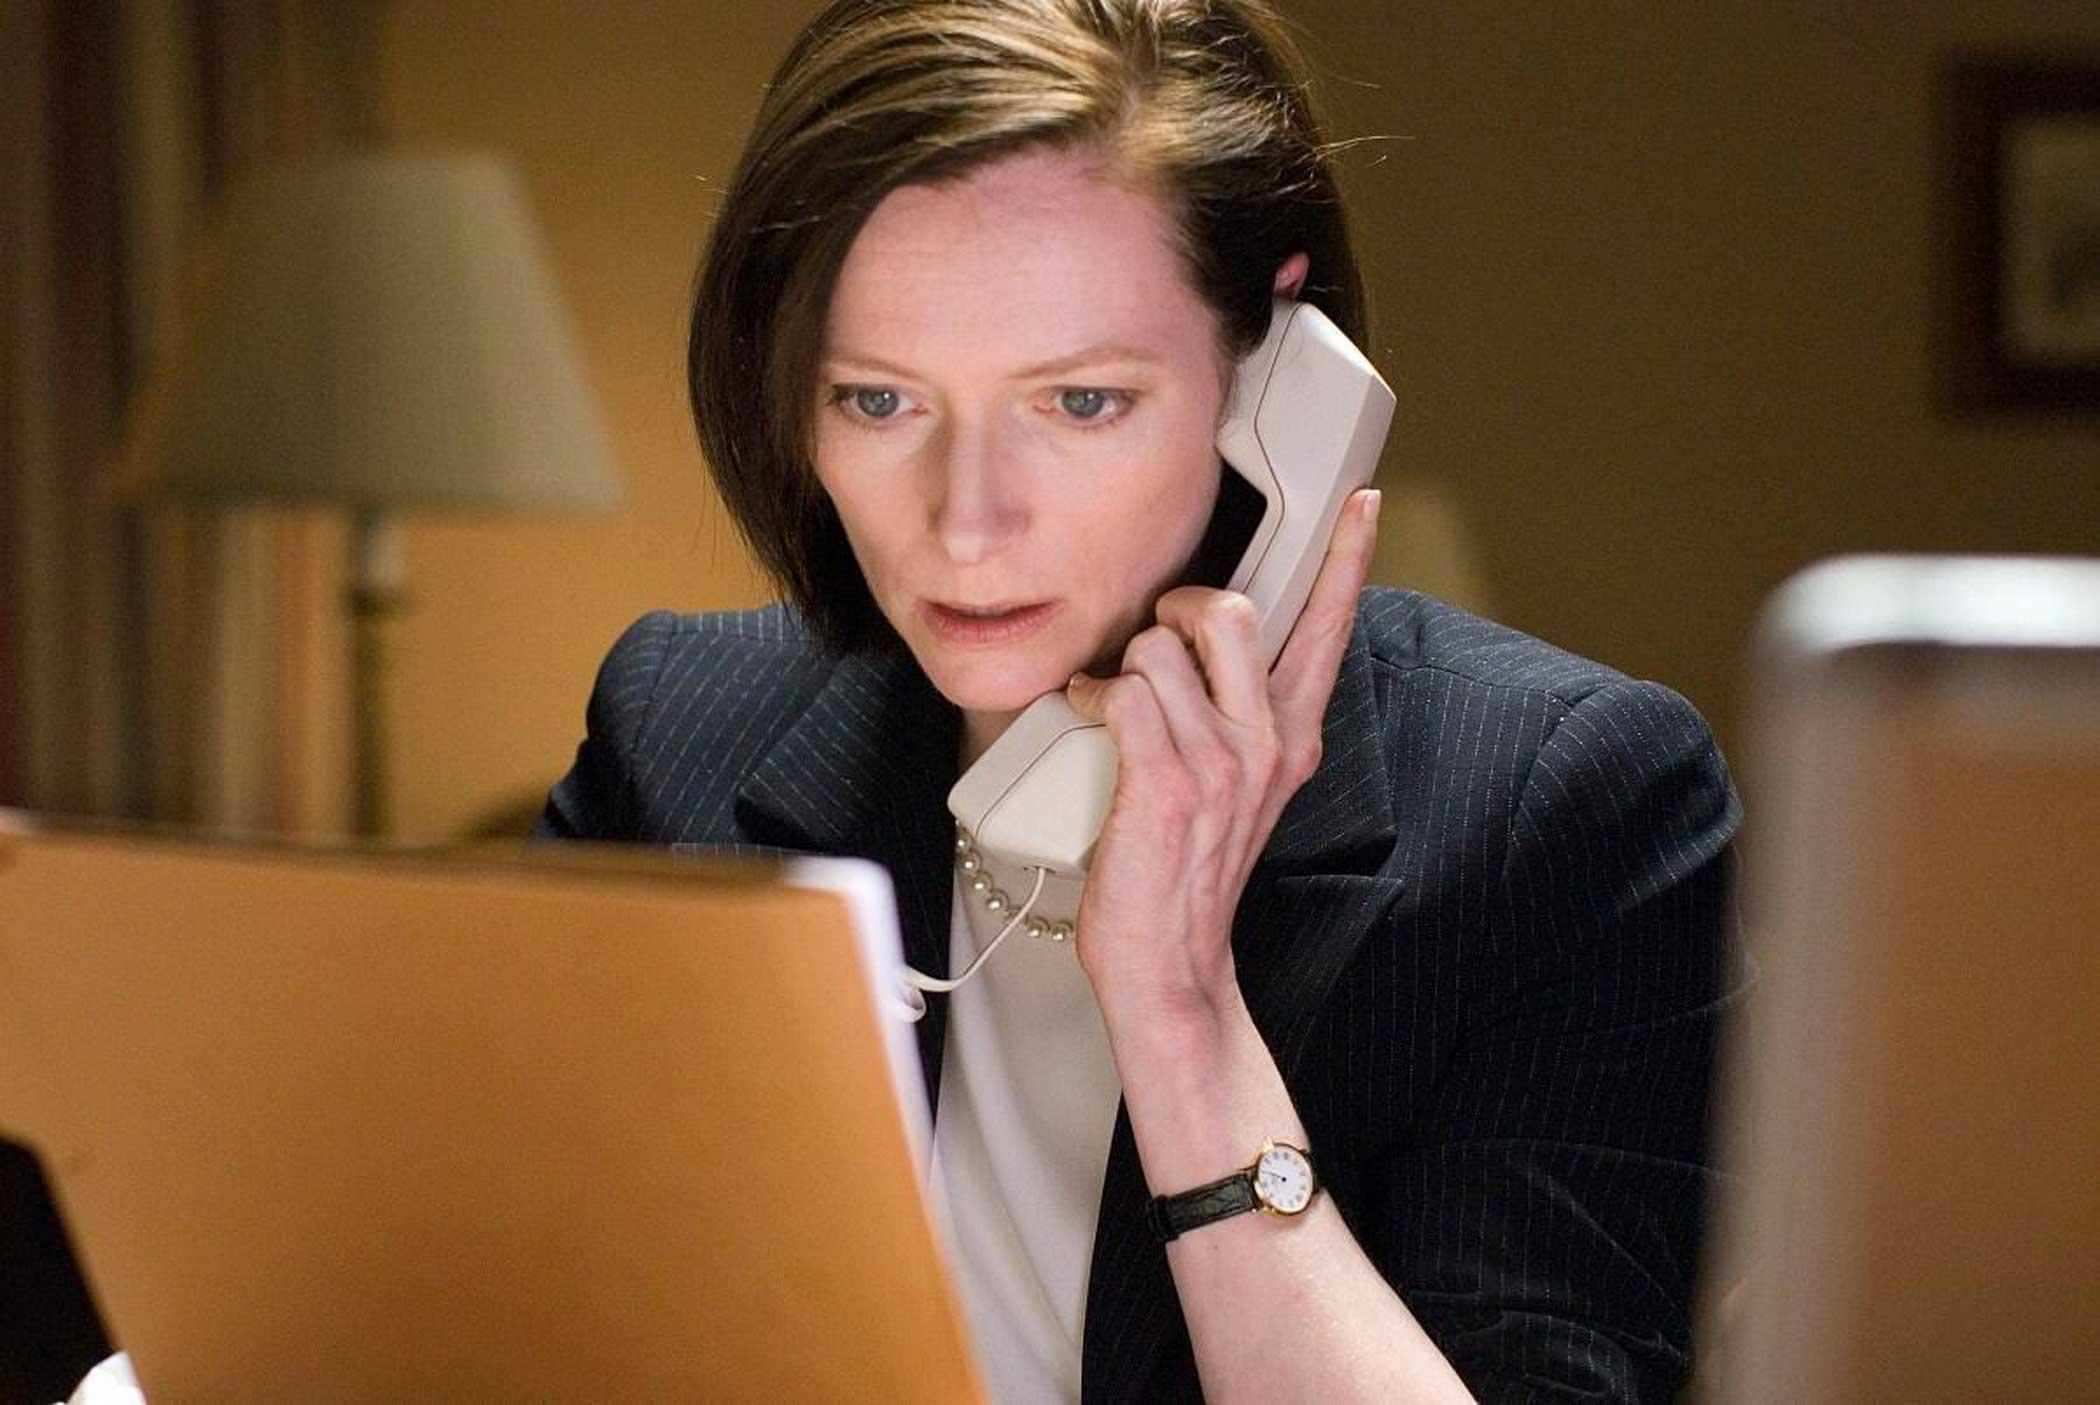 Tilda Swinton as Karen Crowder in Michael Clayton in 2007.